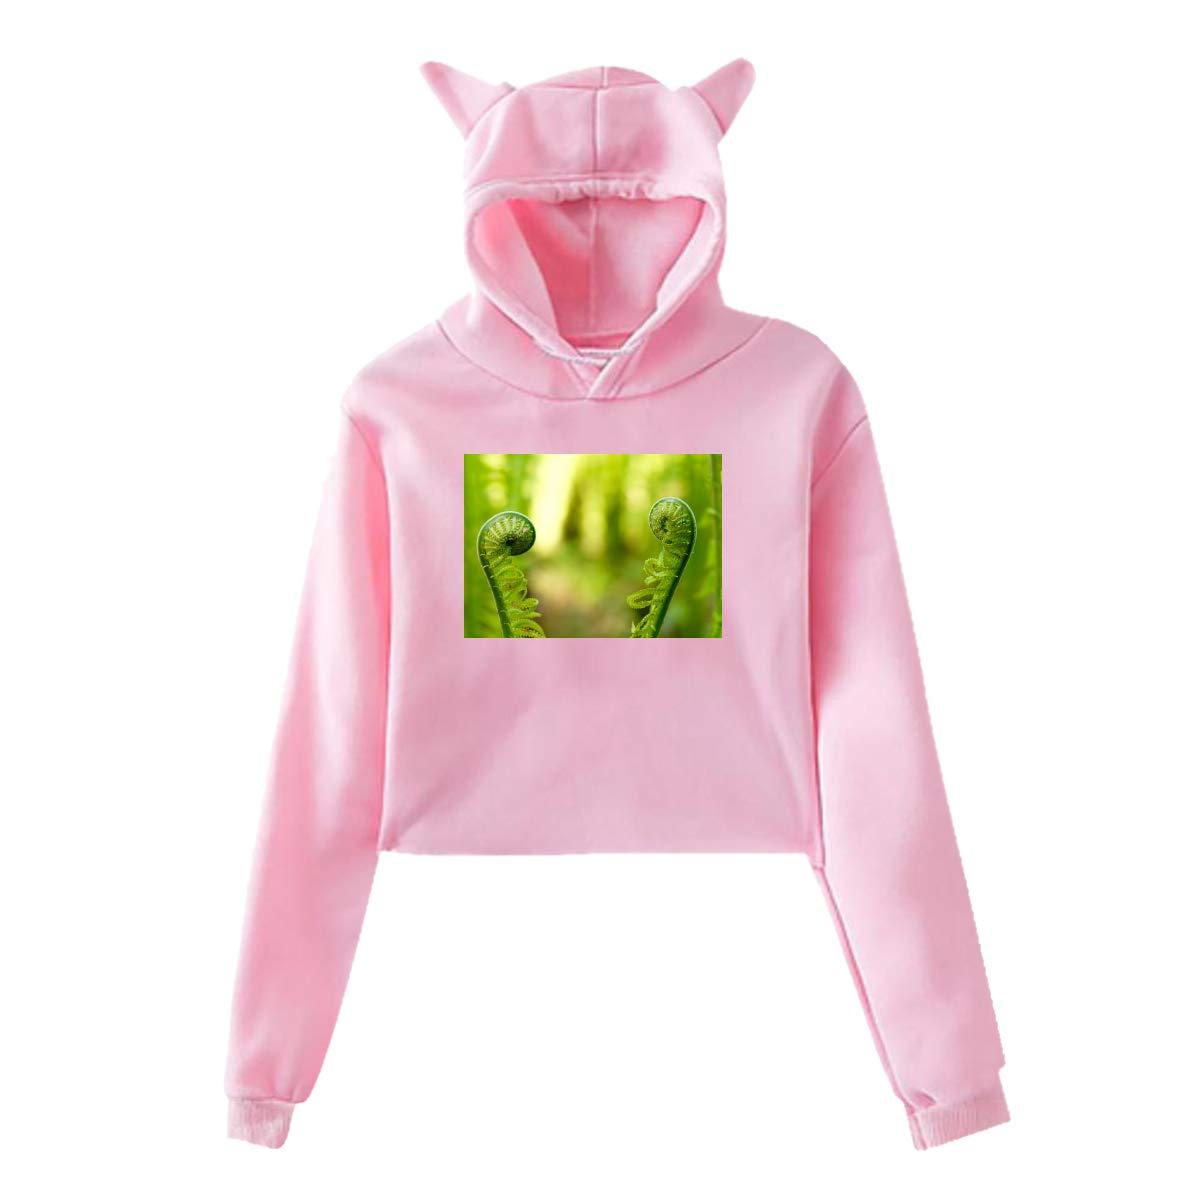 Personality Leaf Girl Cat Ears Umbilical Hoodie,Leaf Fashion Sweatshirt Sweater Pink